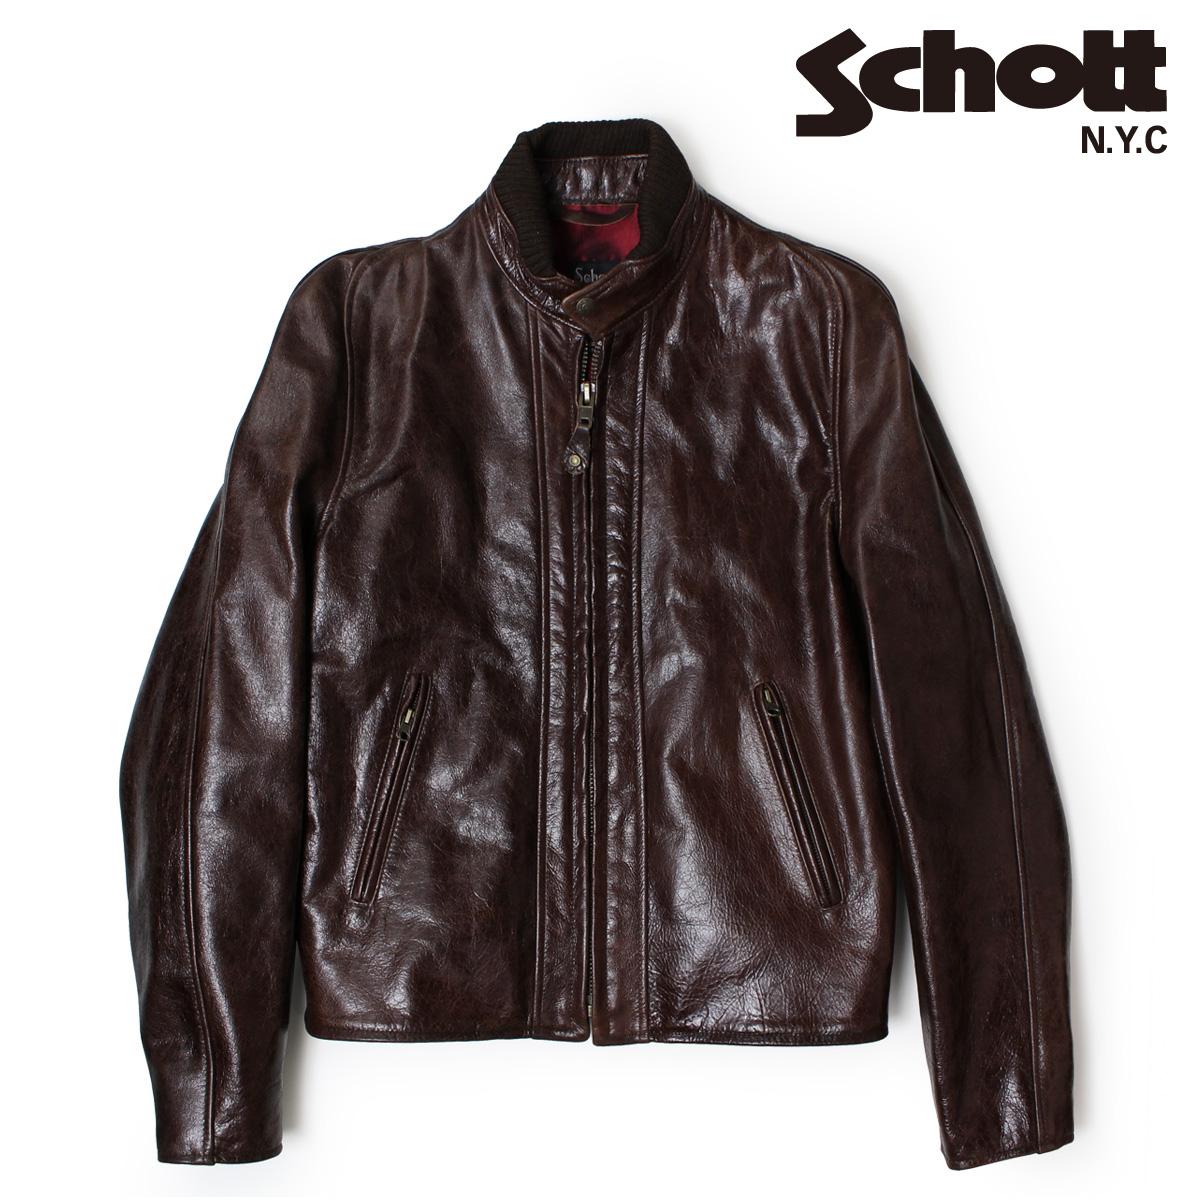 Schott ライダースジャケット ショット ジャケット レザージャケット LEATHER JACKET 588 ANT メンズ